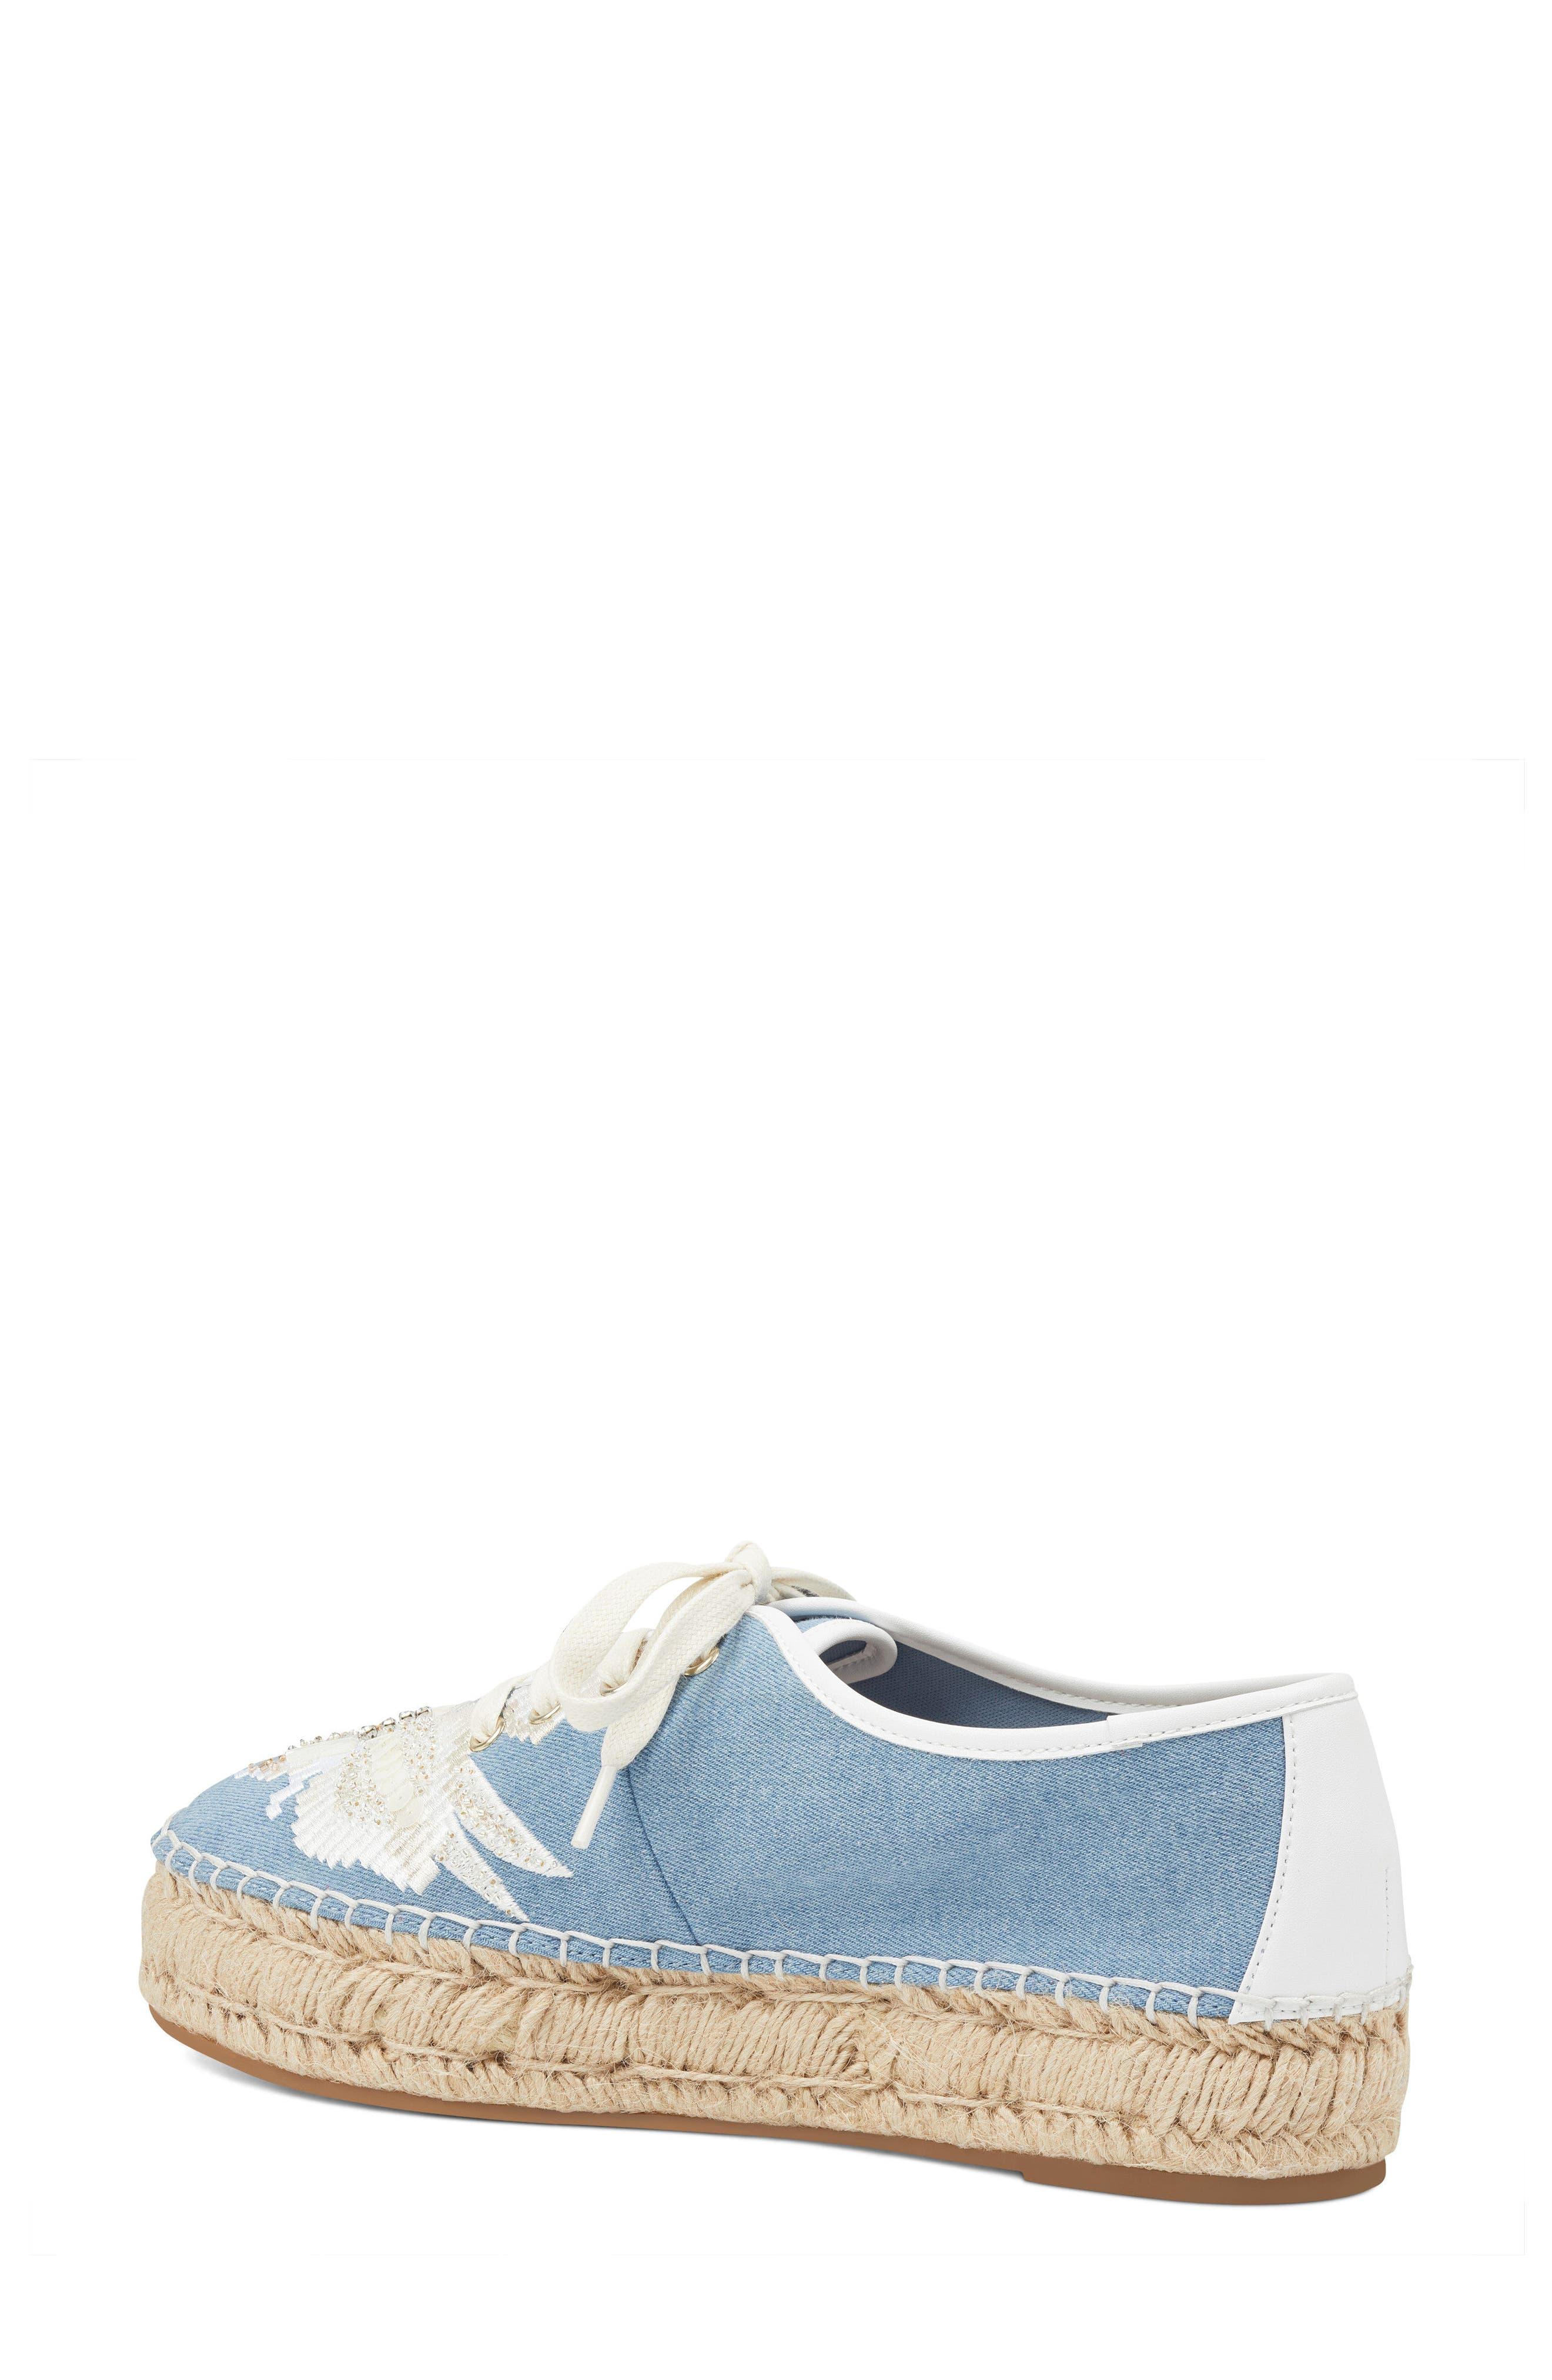 Guinup Embellished Espadrille Sneaker,                             Alternate thumbnail 2, color,                             Light Blue/ White Denim